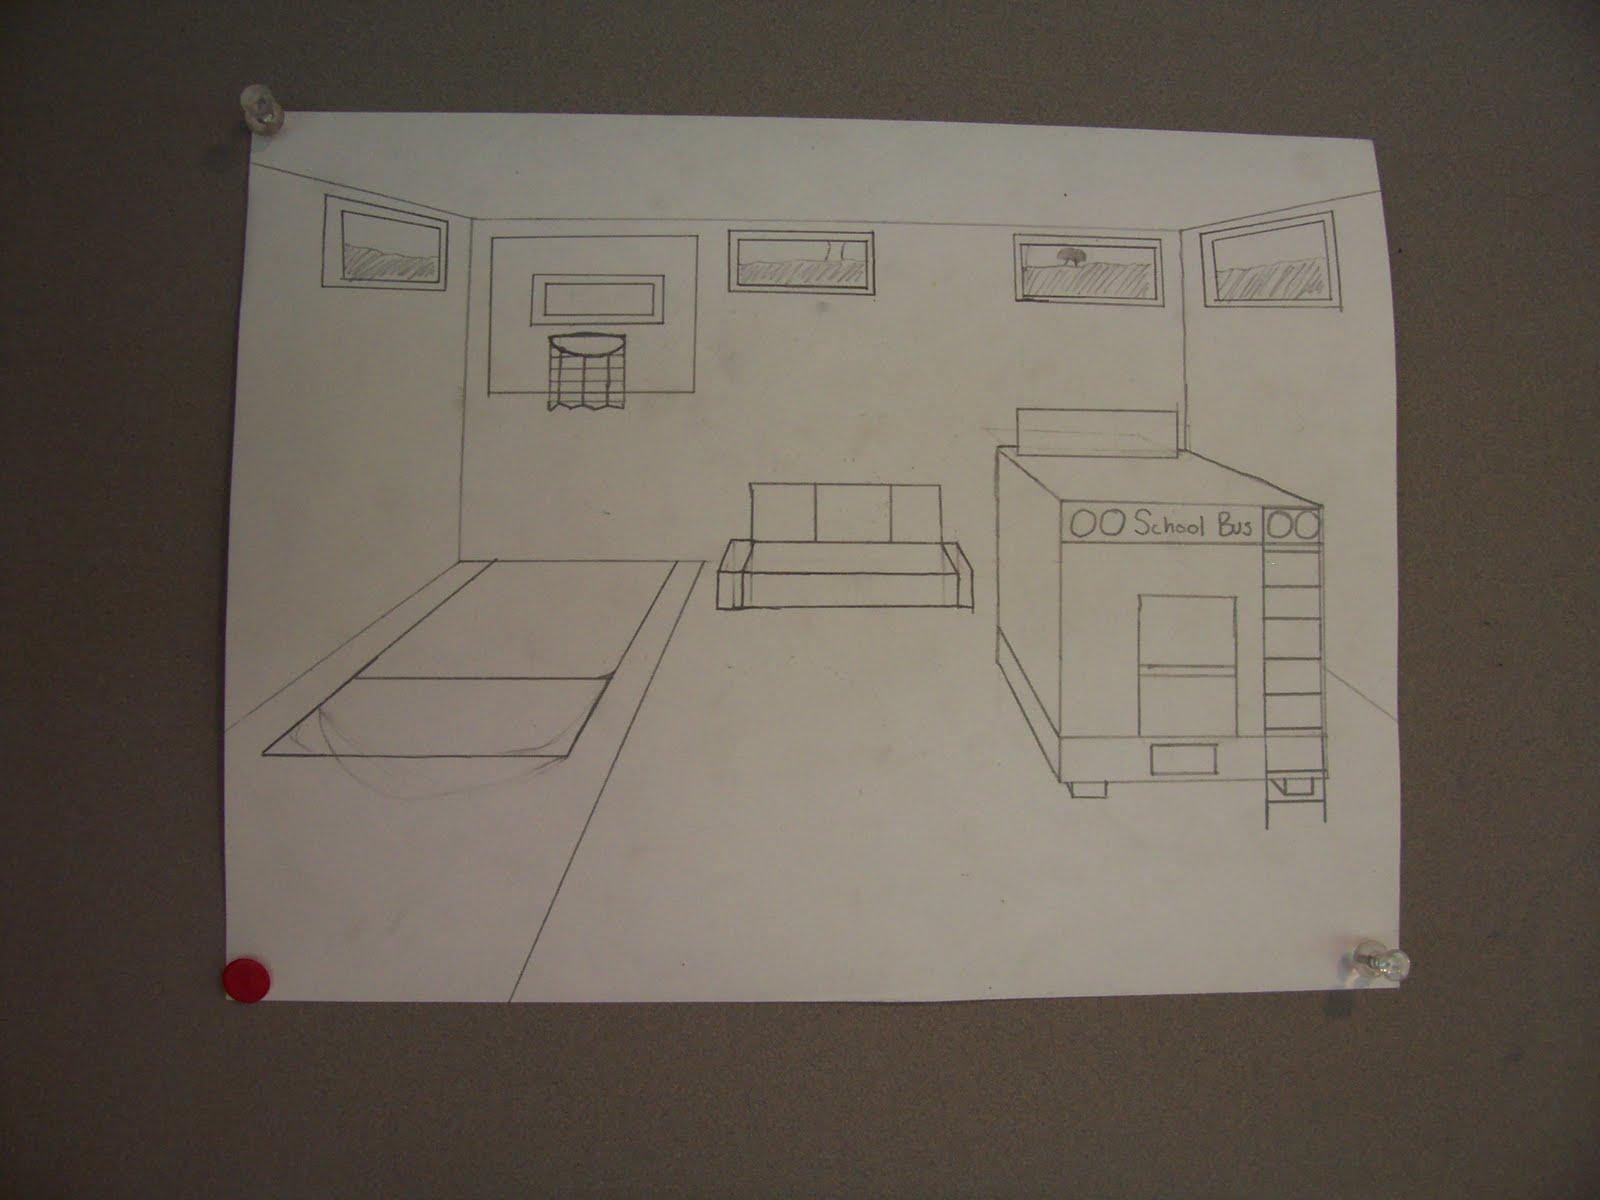 Irvington Community Middle School Art Room Interiors 8th